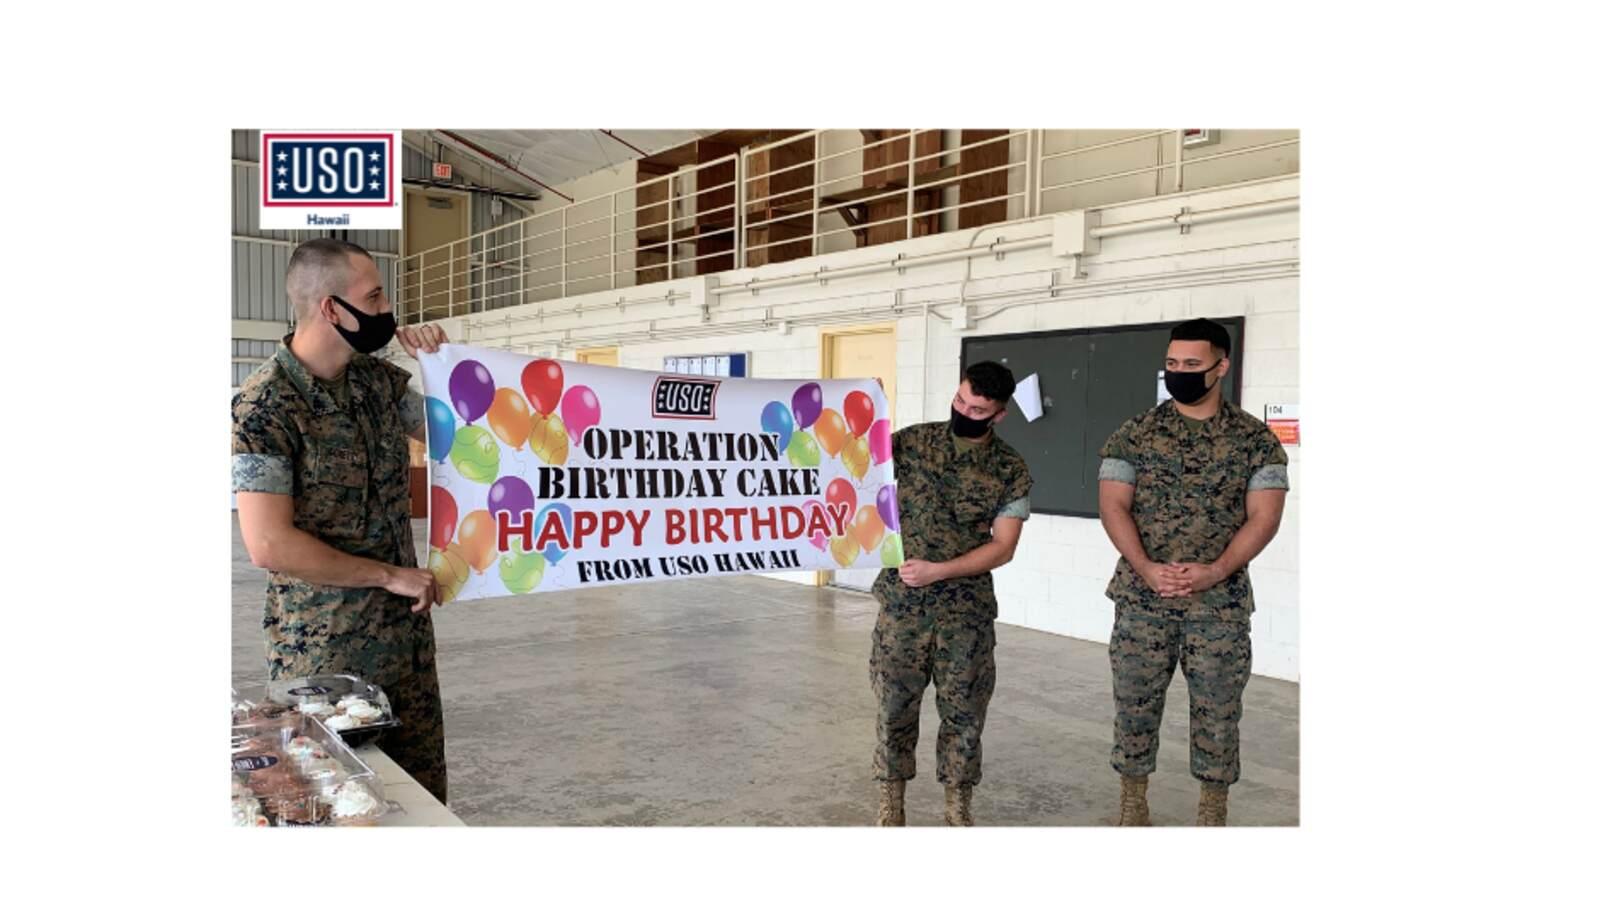 Operation Birthday Cake O USO Hawaii